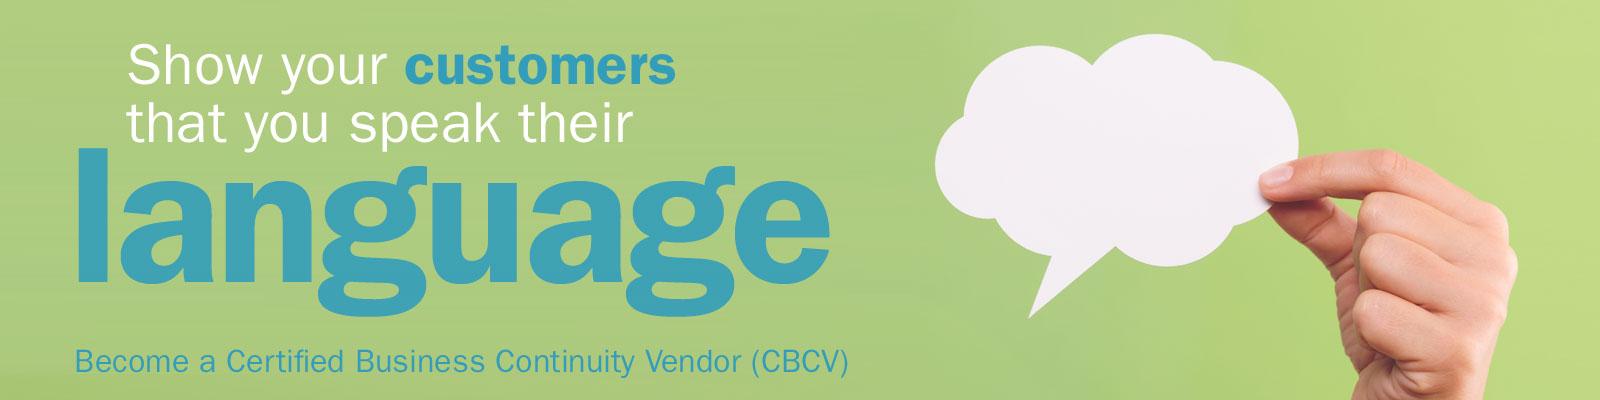 Become a CBCV!